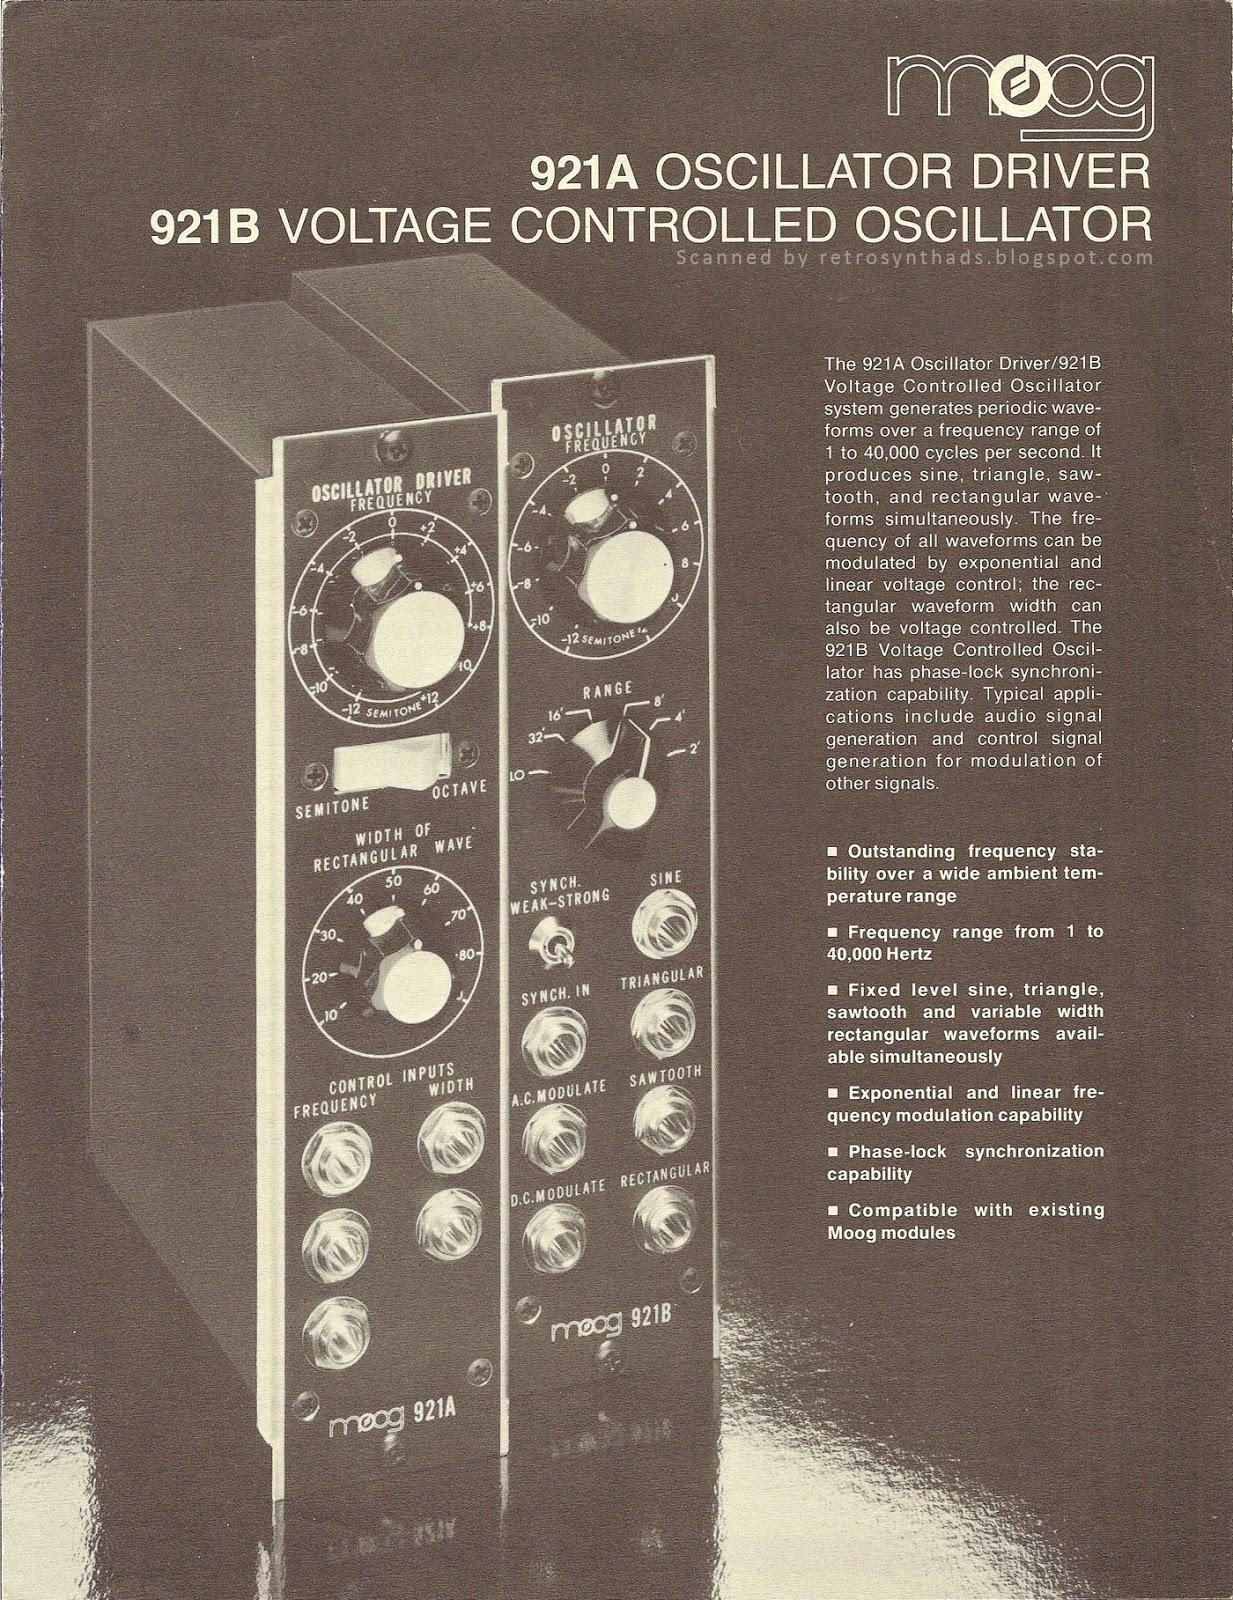 http://retrosynthads.blogspot.ca/2014/09/moog-921a-oscillator-driver921b-voltage.html